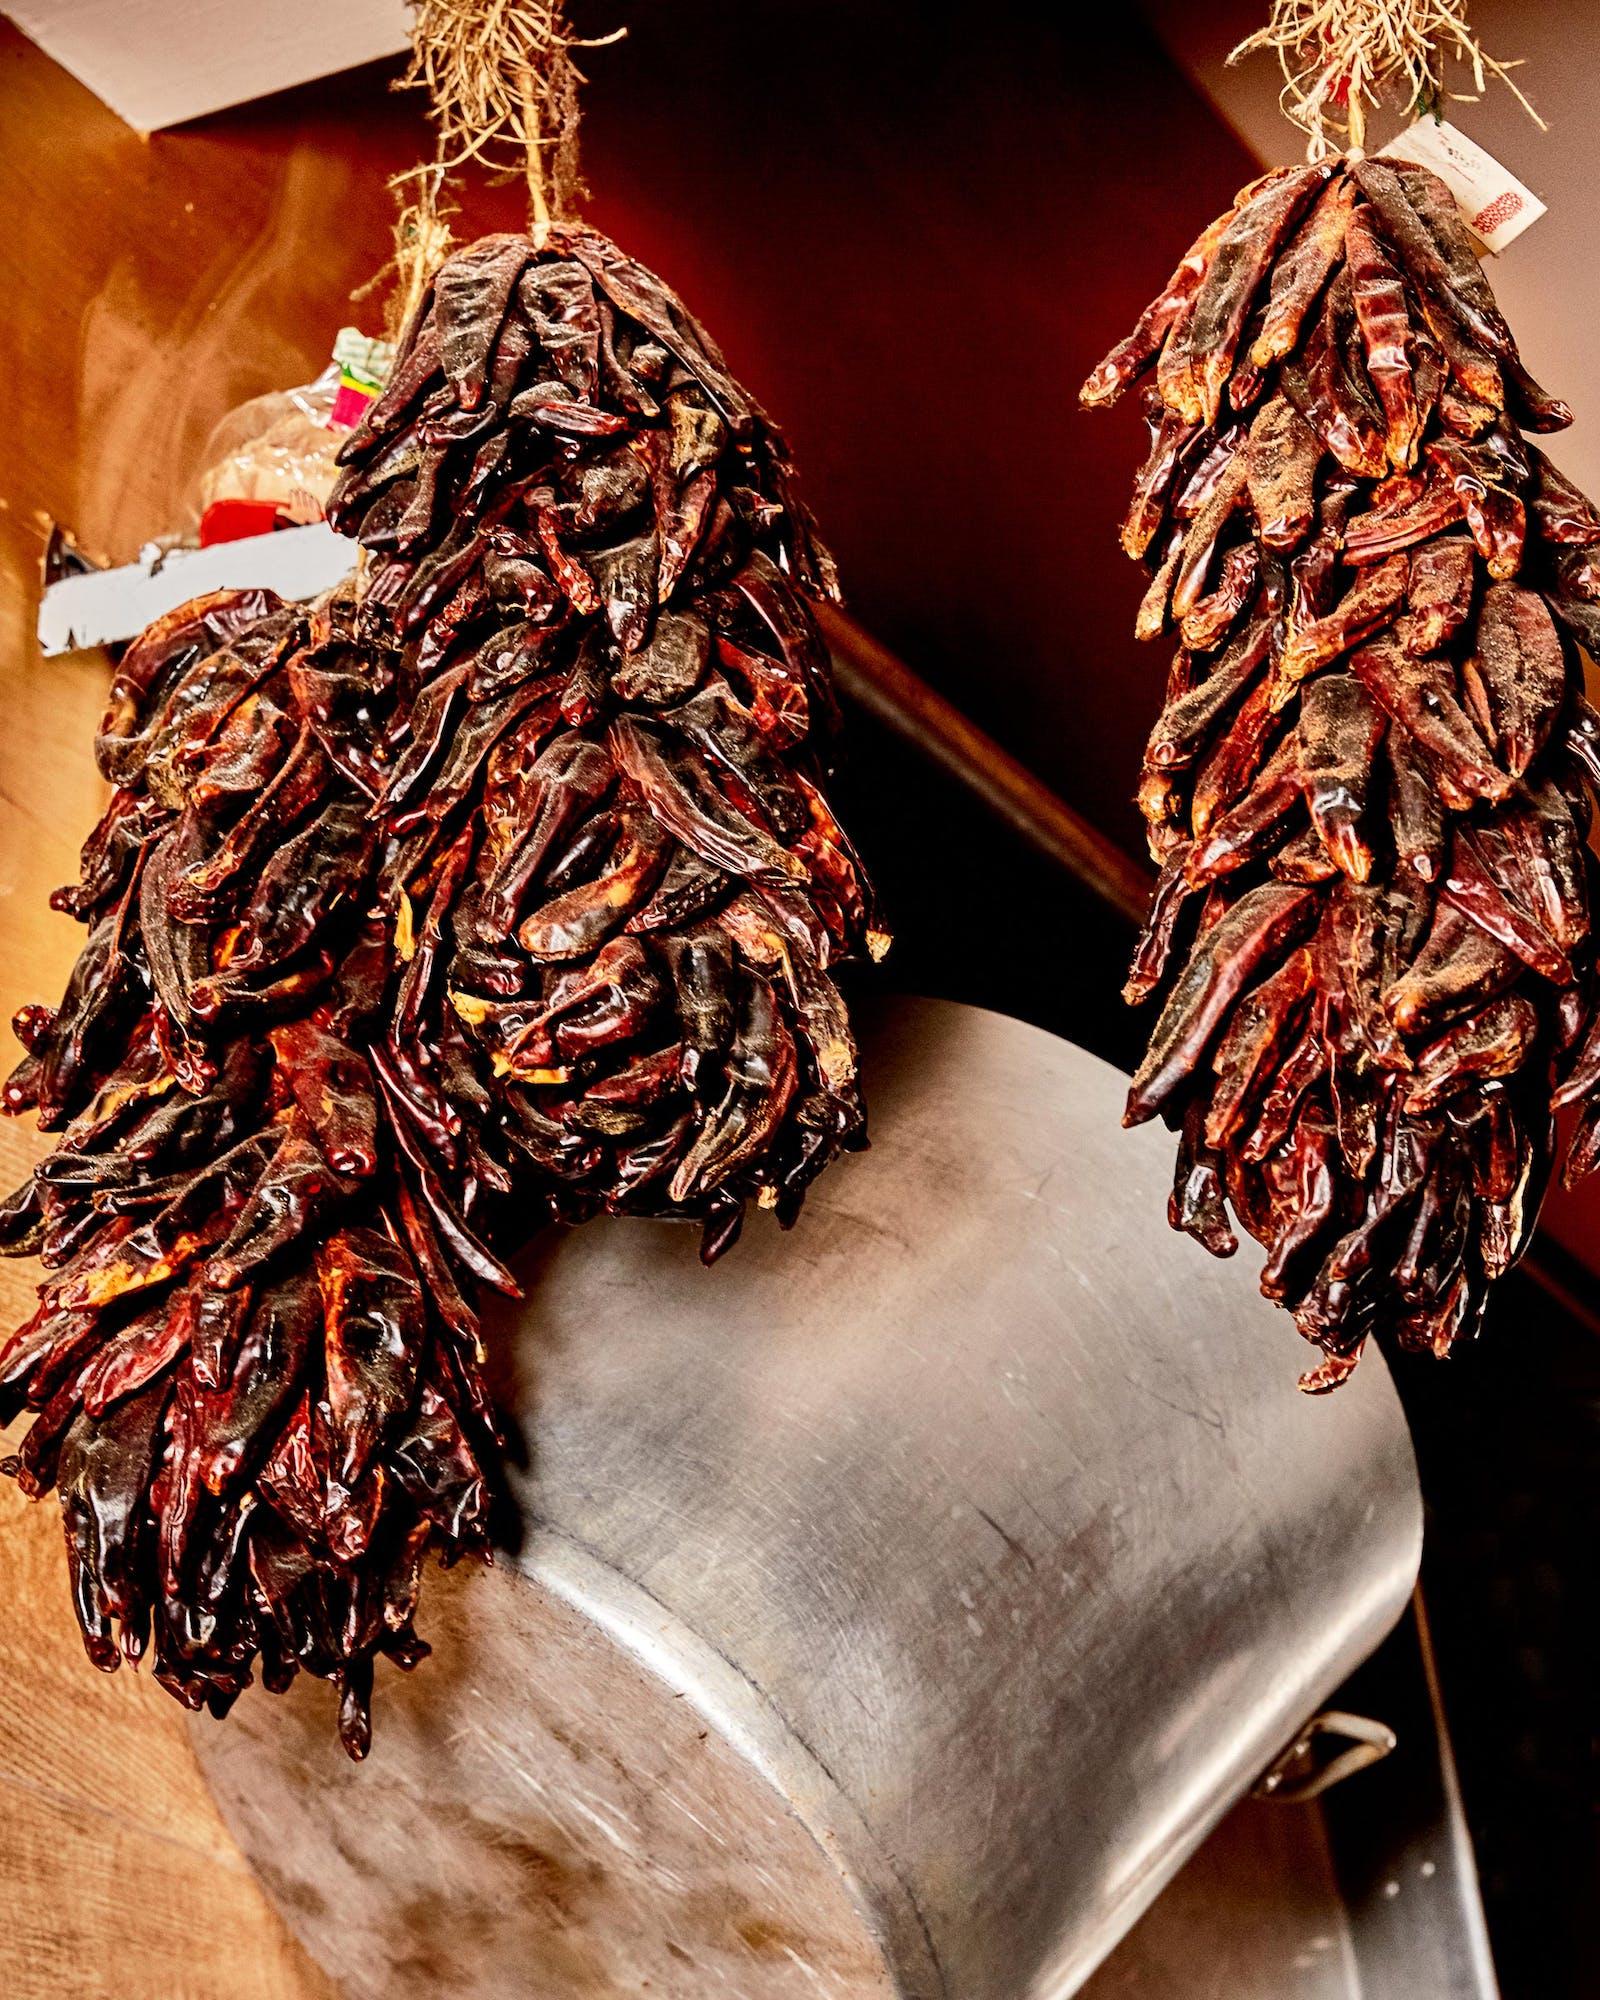 japanese-tacos-regino-rojas